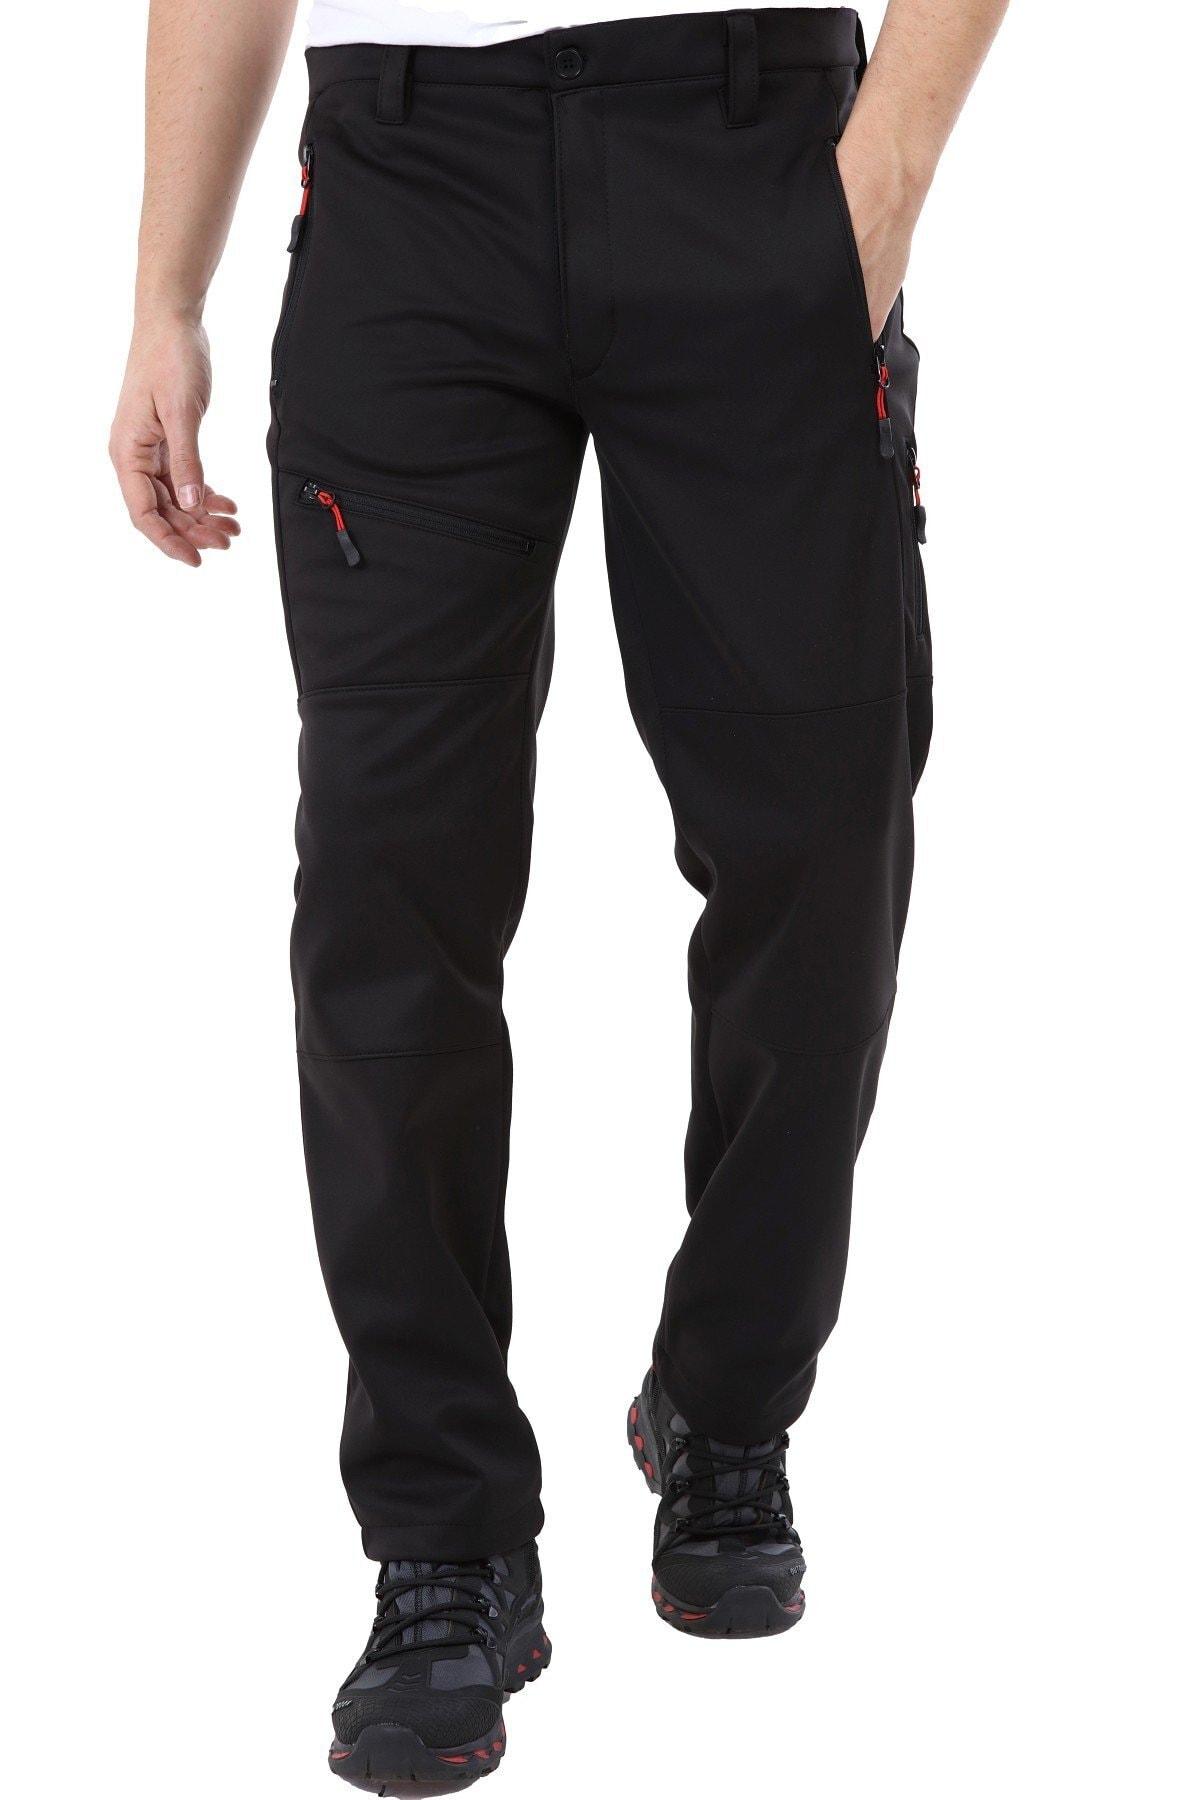 GHASSY CO. Erkek Tactical Outdoor Su Geçirmez Siyah Softshell Pantolon 1